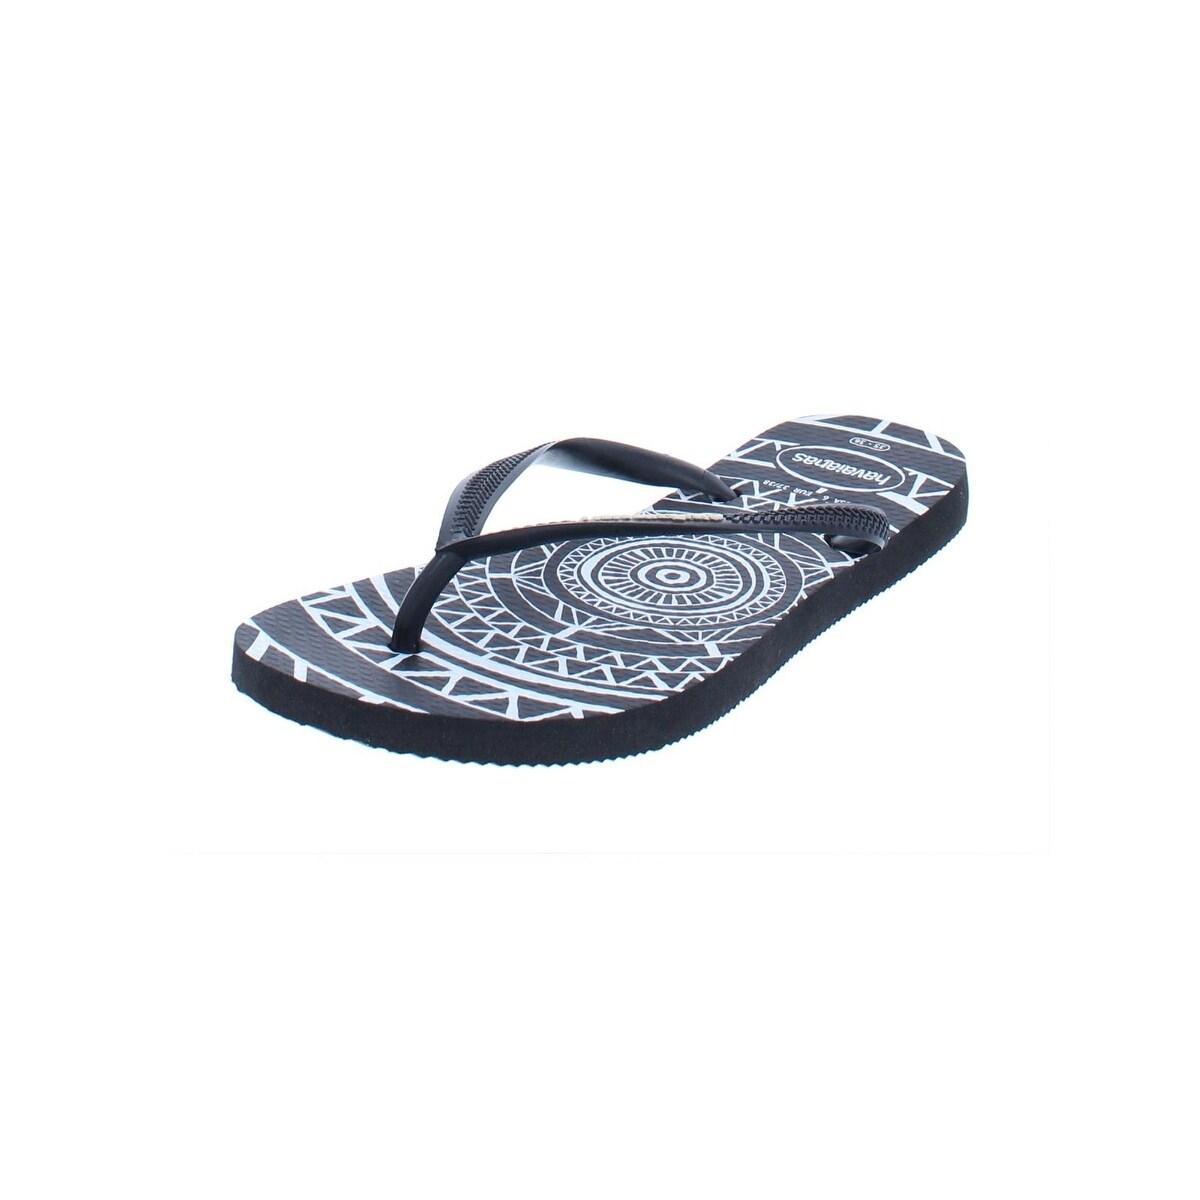 6dc656614 Shop Havaianas Slim Womens Mandala Flip-Flops Rubber Thong - Free ...